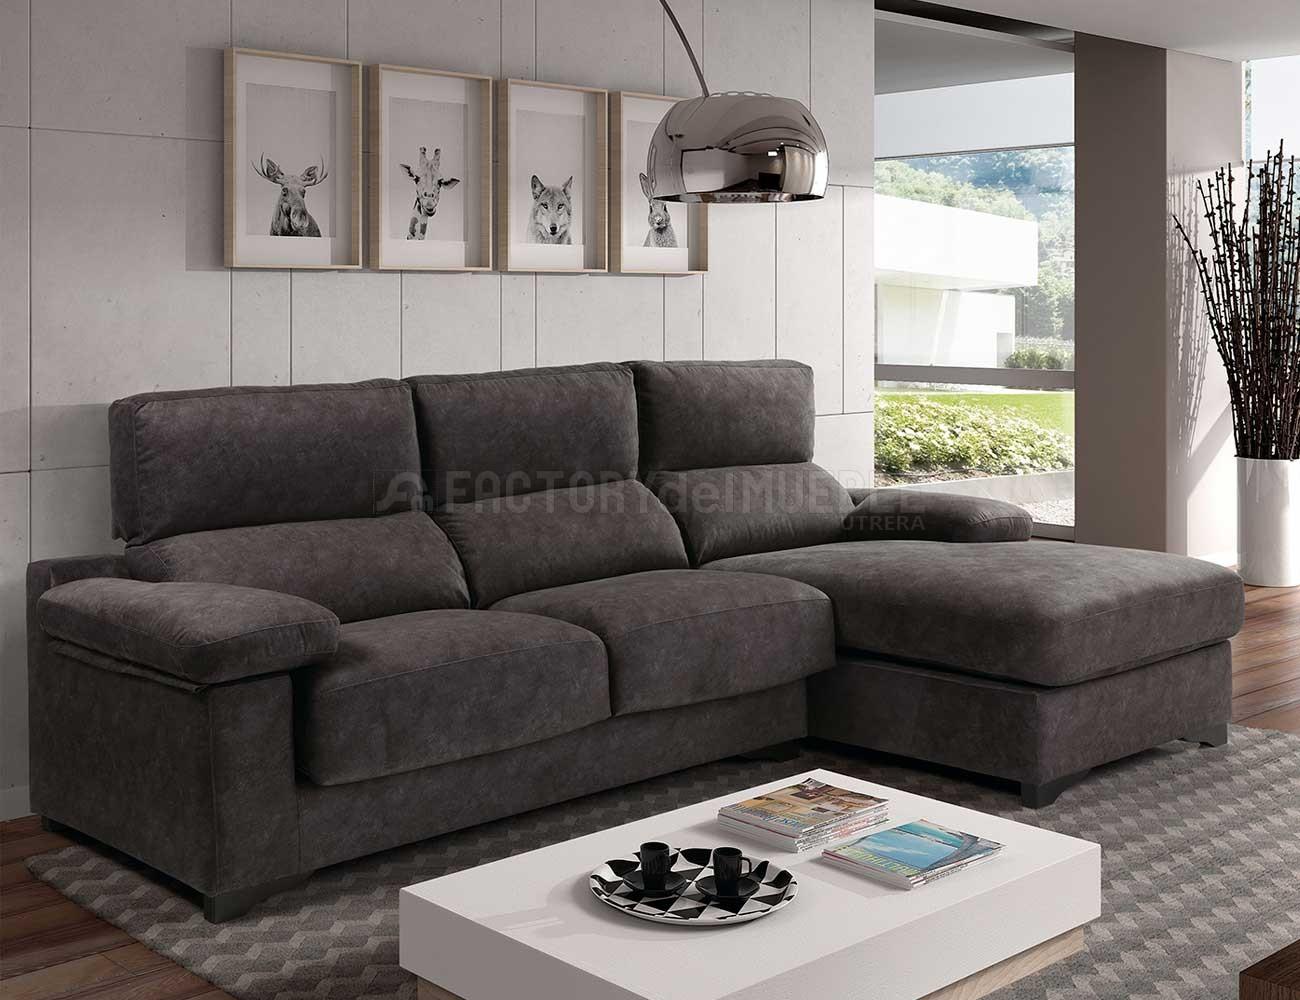 Sof Chaiselongue Oliver De Gran Calidad 22363 Factory Del  # Muebles Tasa Cero